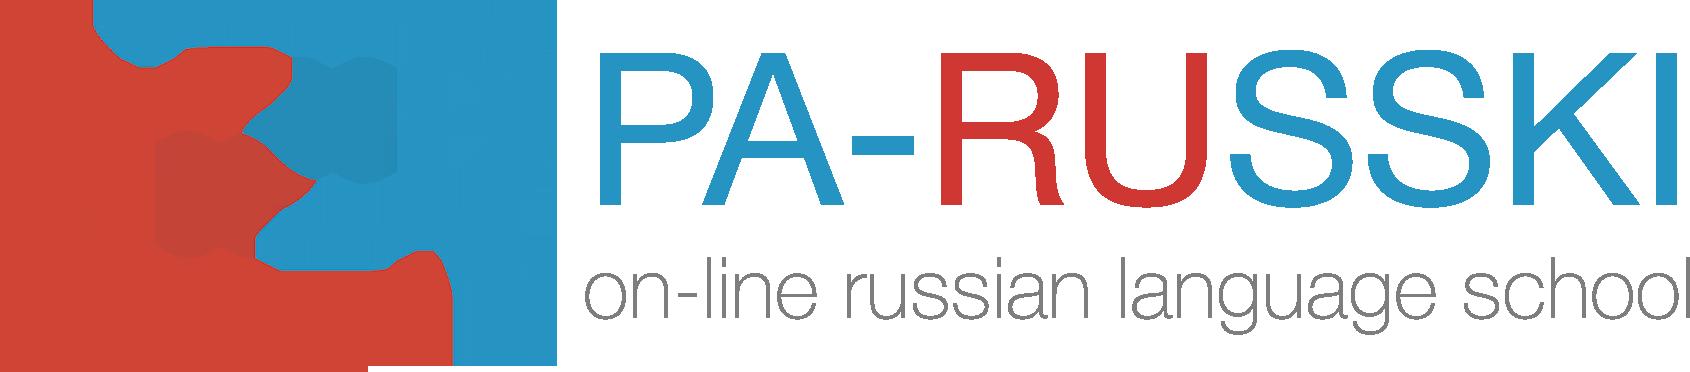 On-line Russian language school Pa-russki!